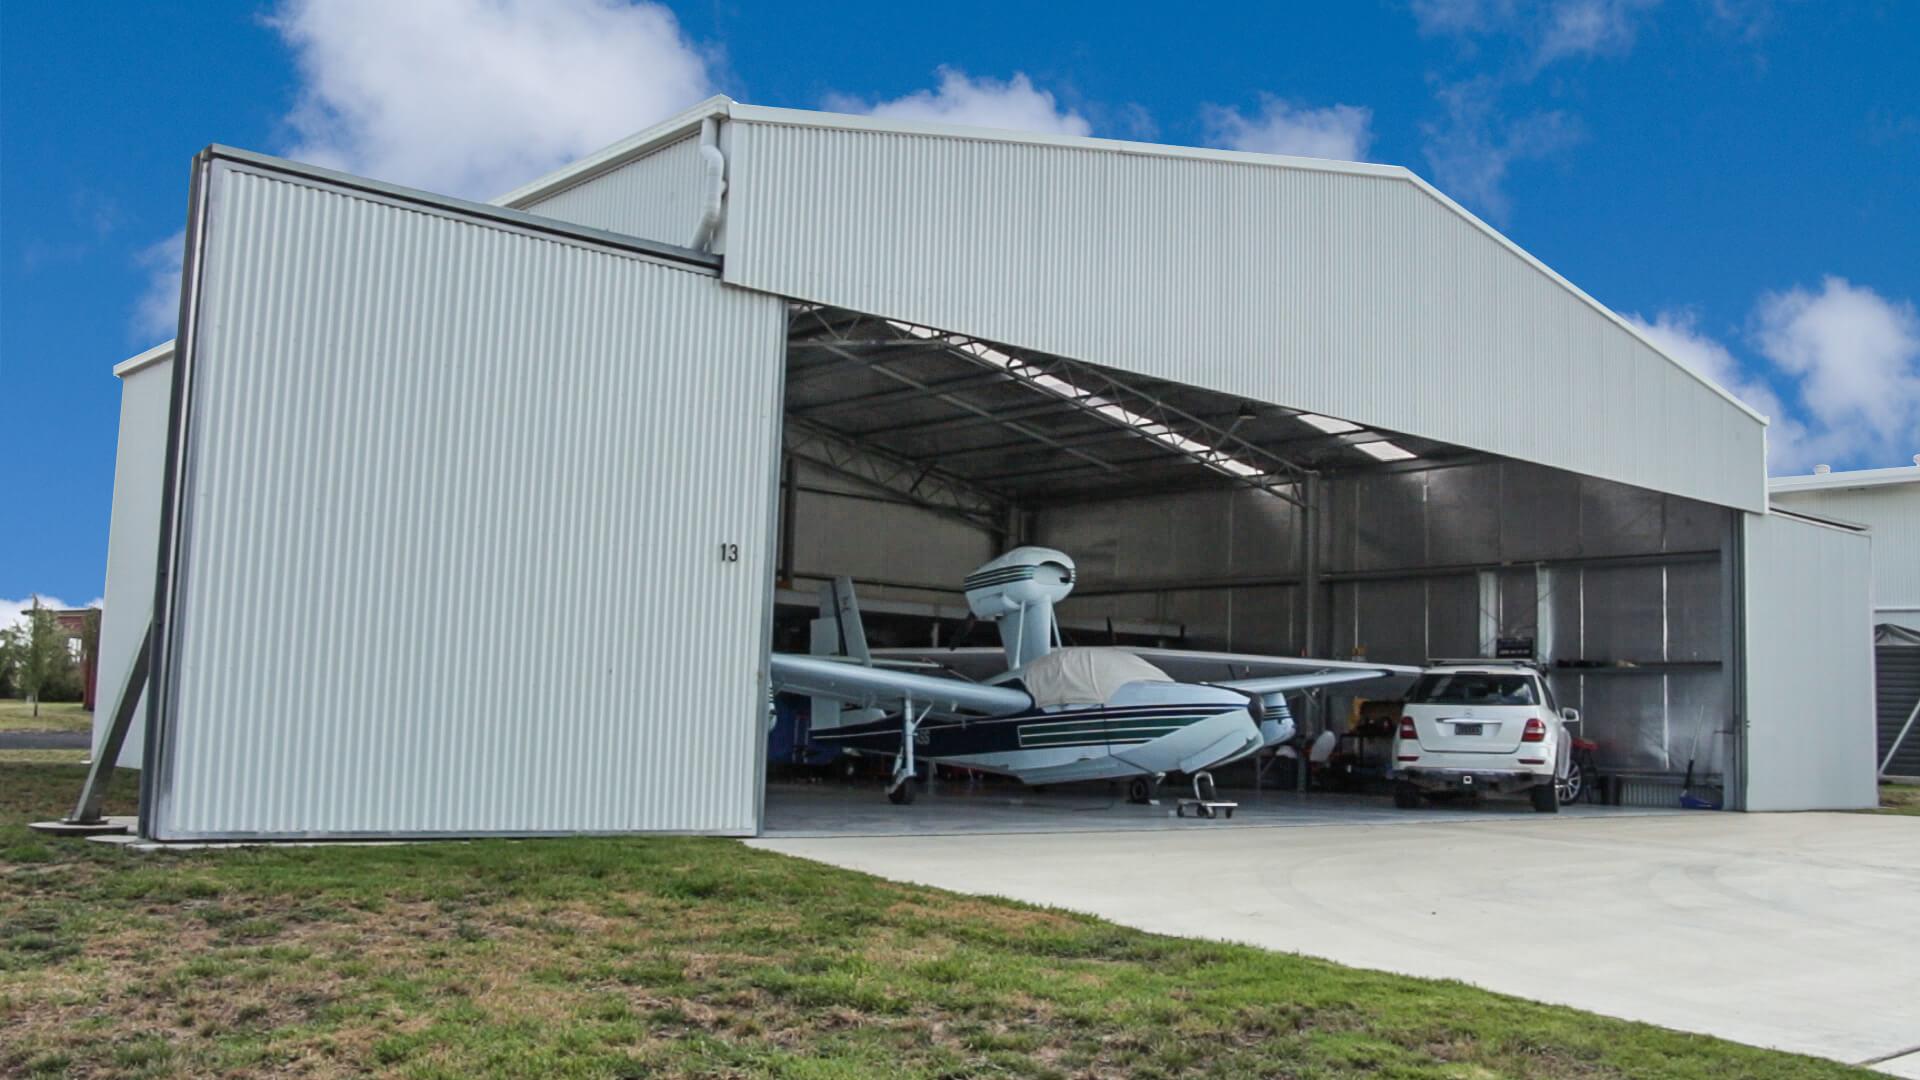 Aircraft hangar by ABC Sheds